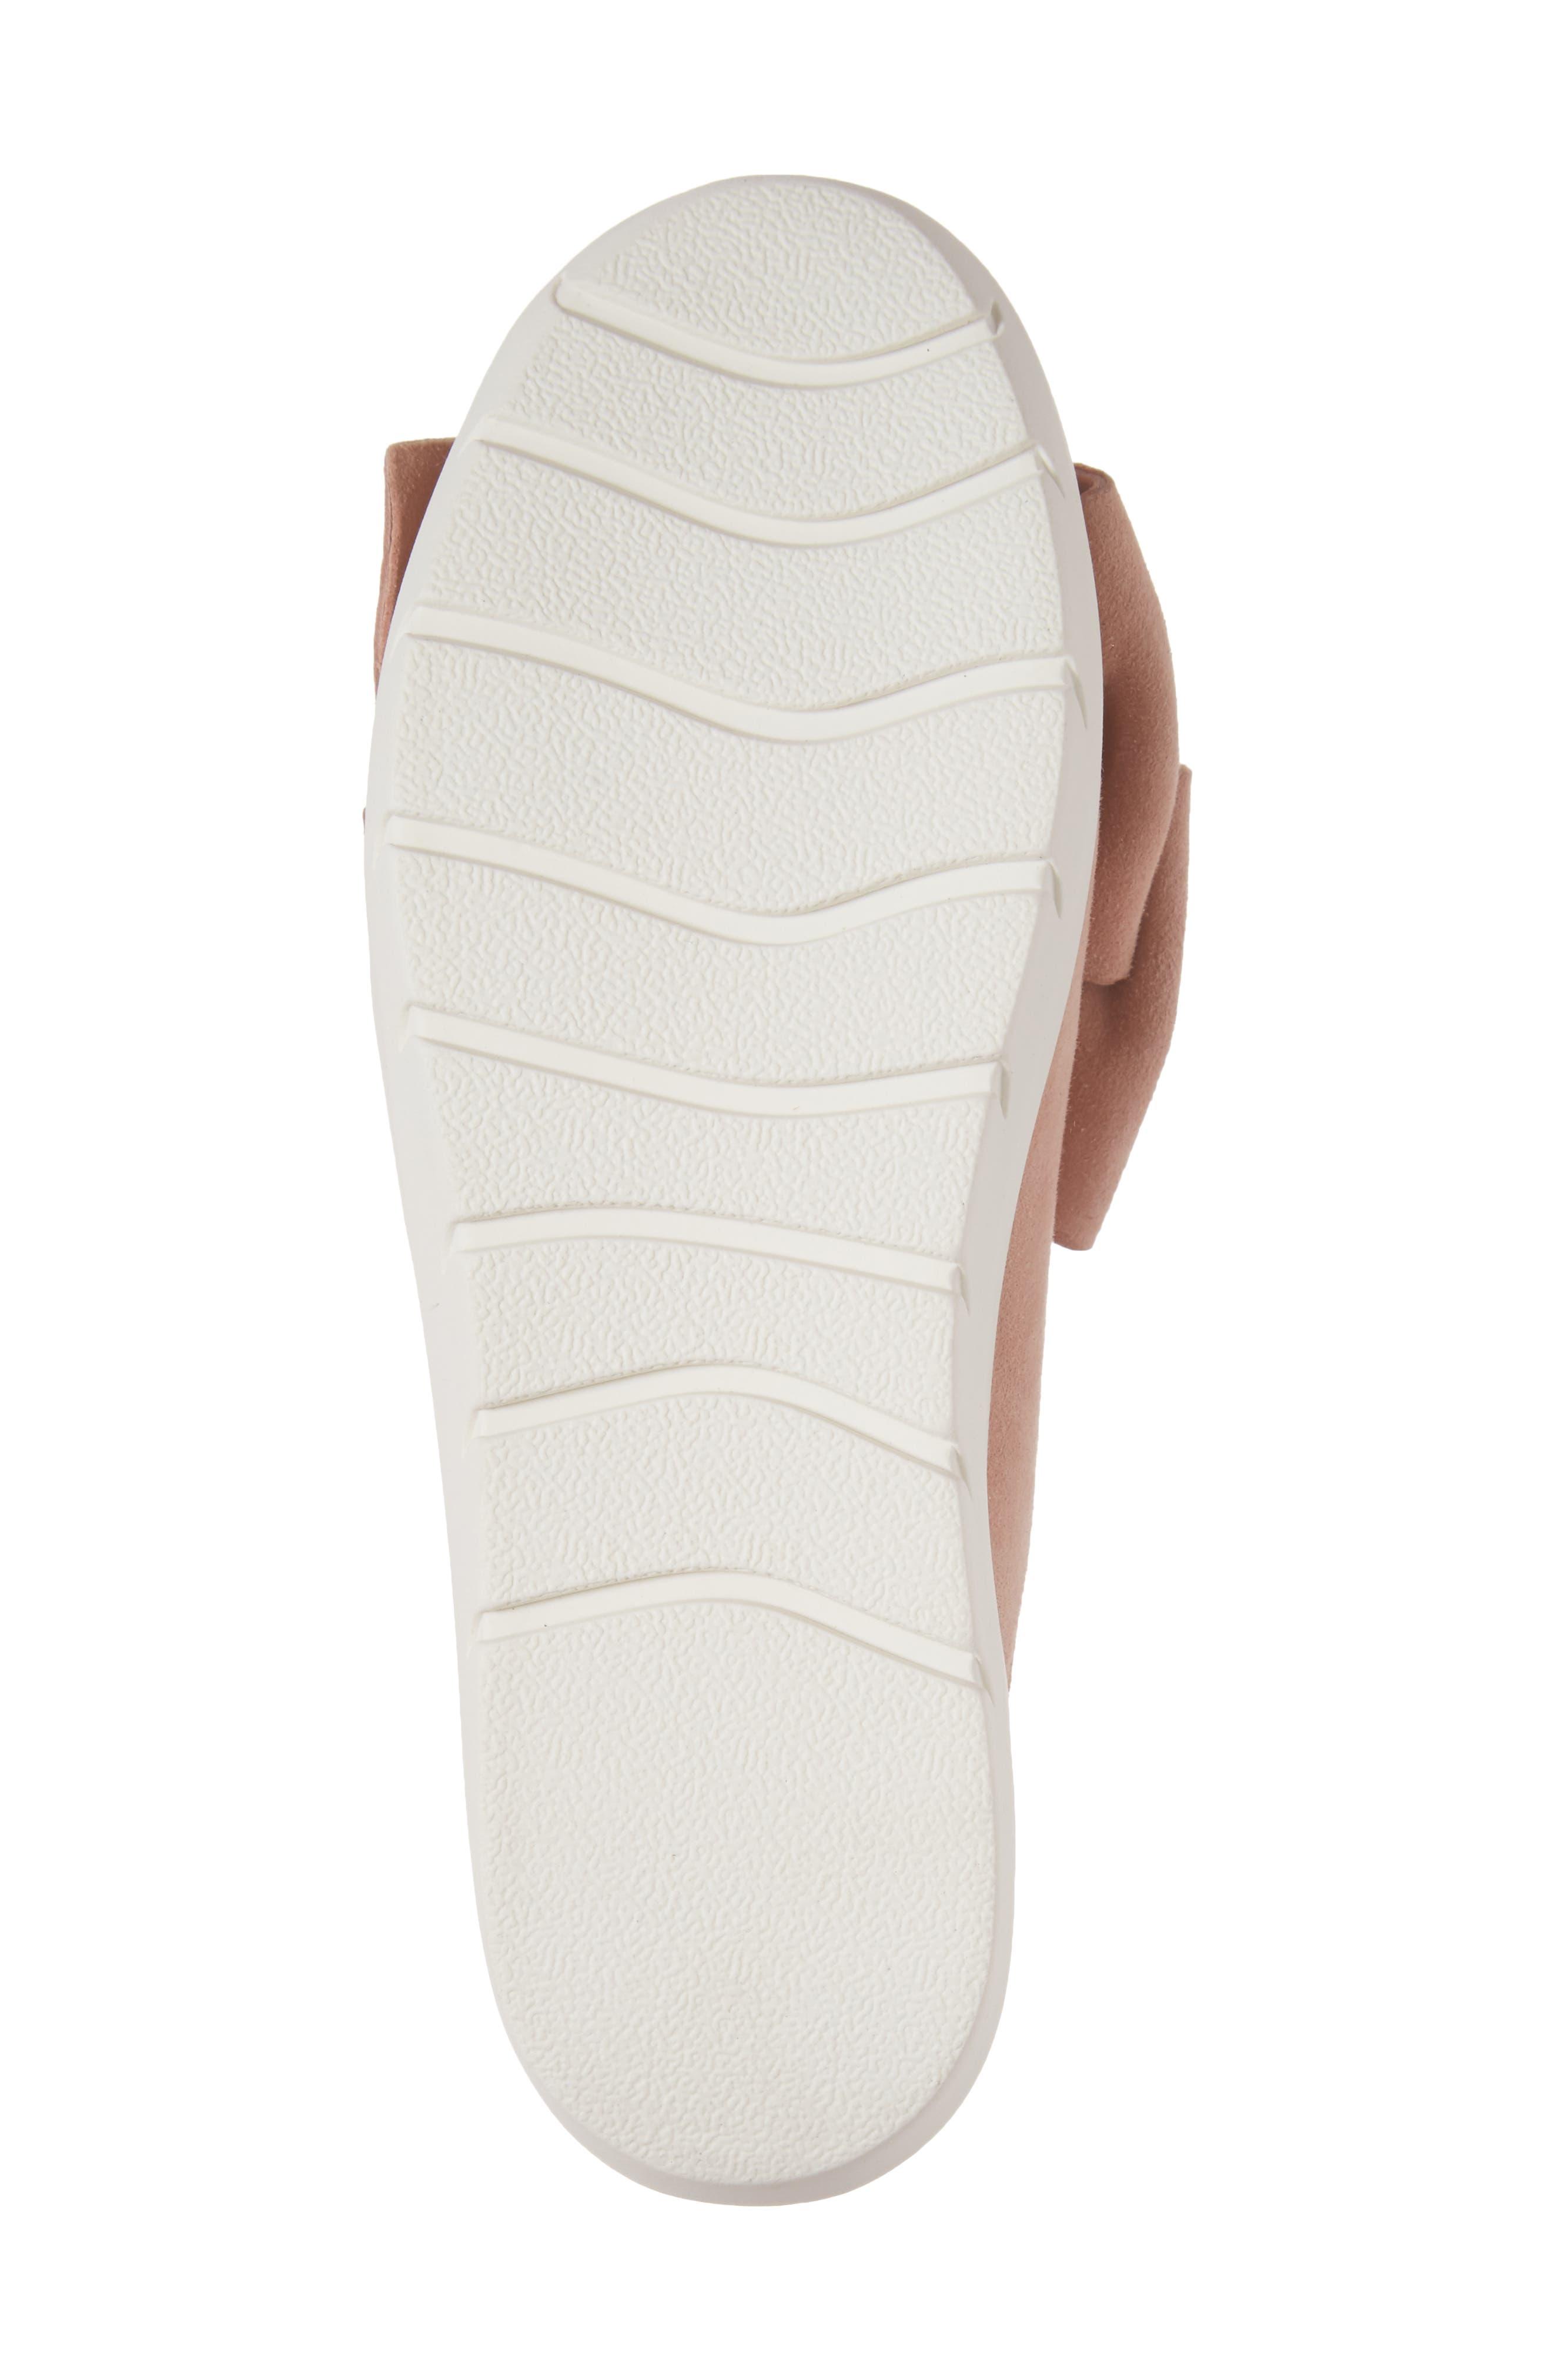 Tibow Platform Slide Sneaker,                             Alternate thumbnail 6, color,                             Pale Pink Suede